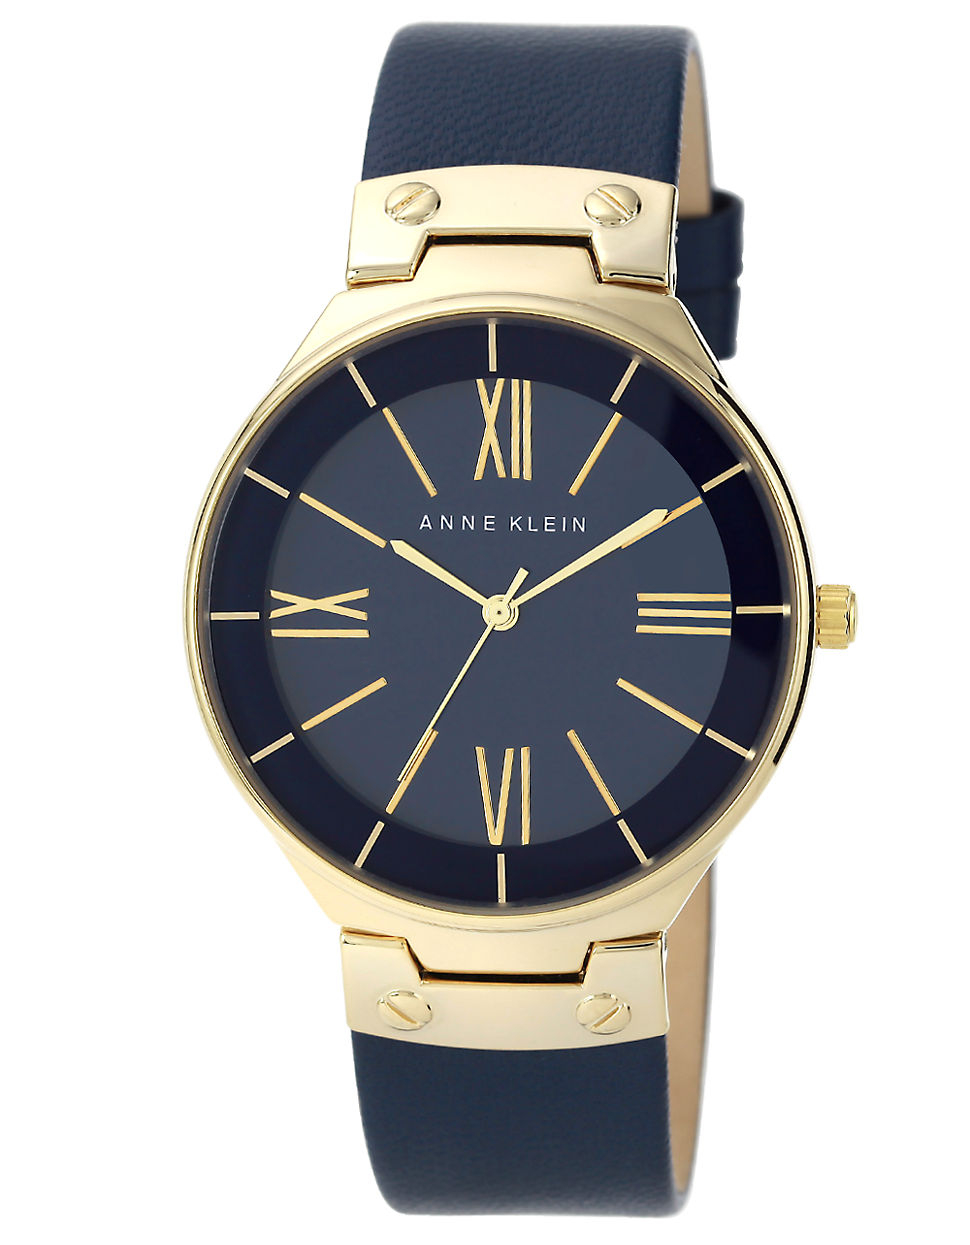 Anne klein ladies goldtone navy watch with leather strap in blue navy lyst for Anne klein leather strap